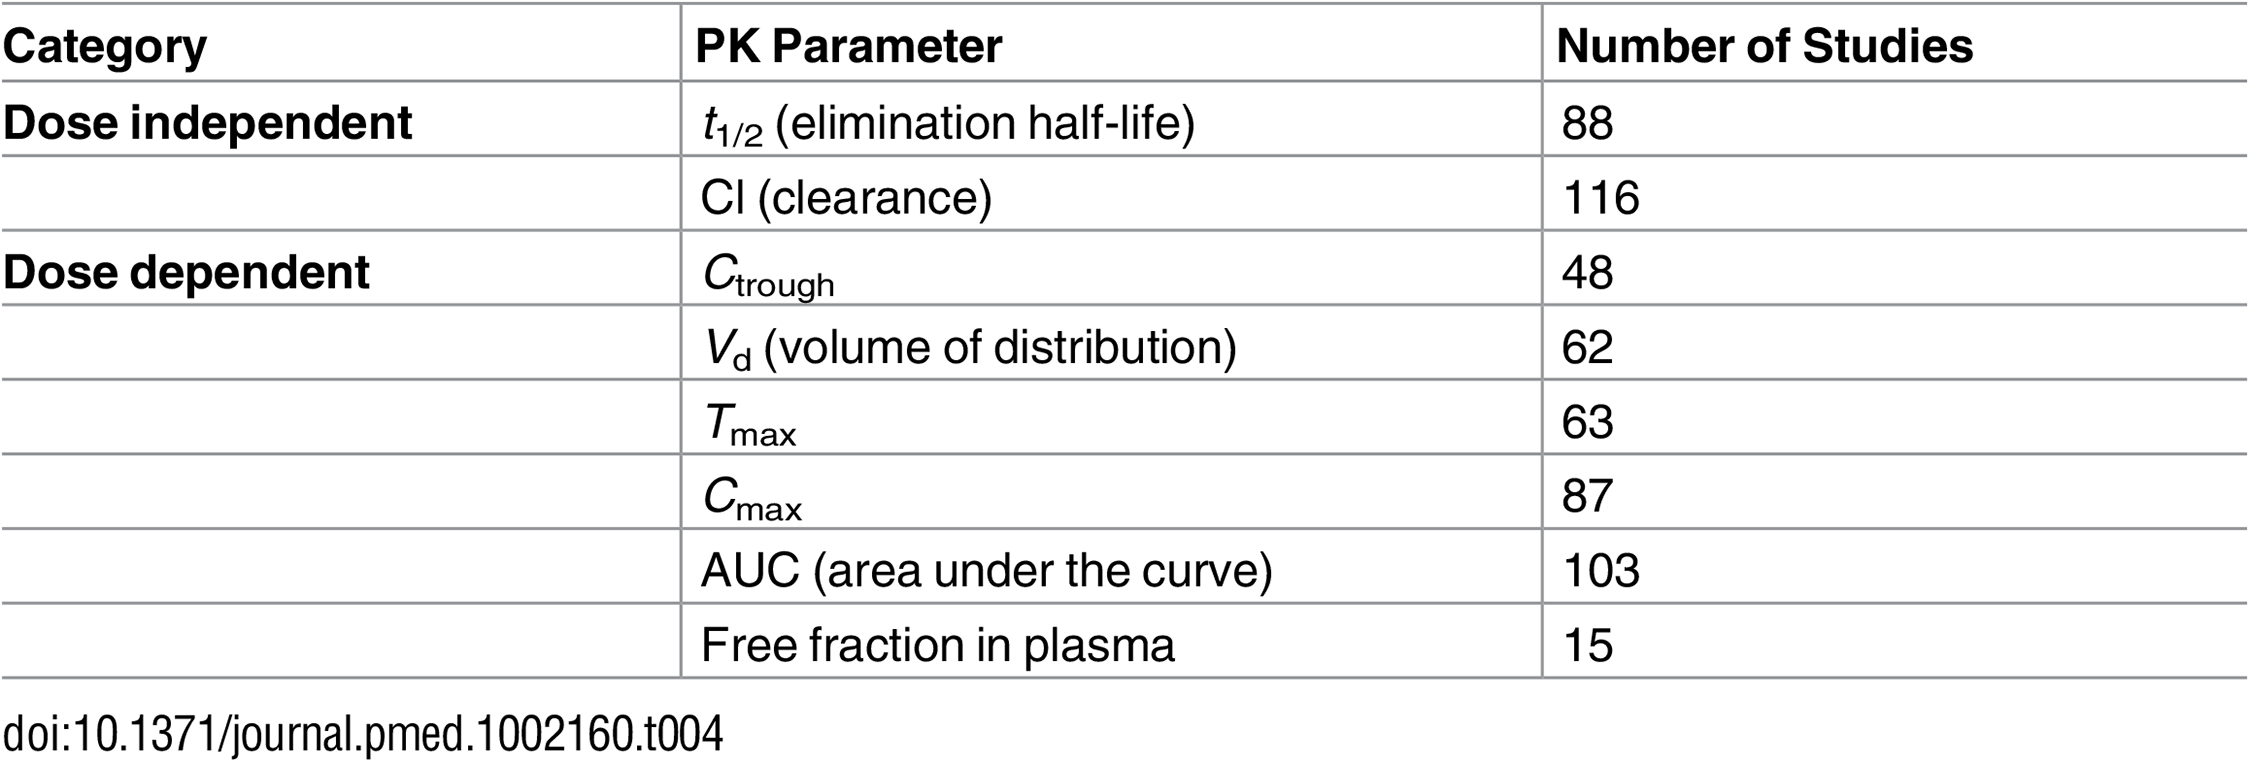 Pharmacokinetics parameters—data count.